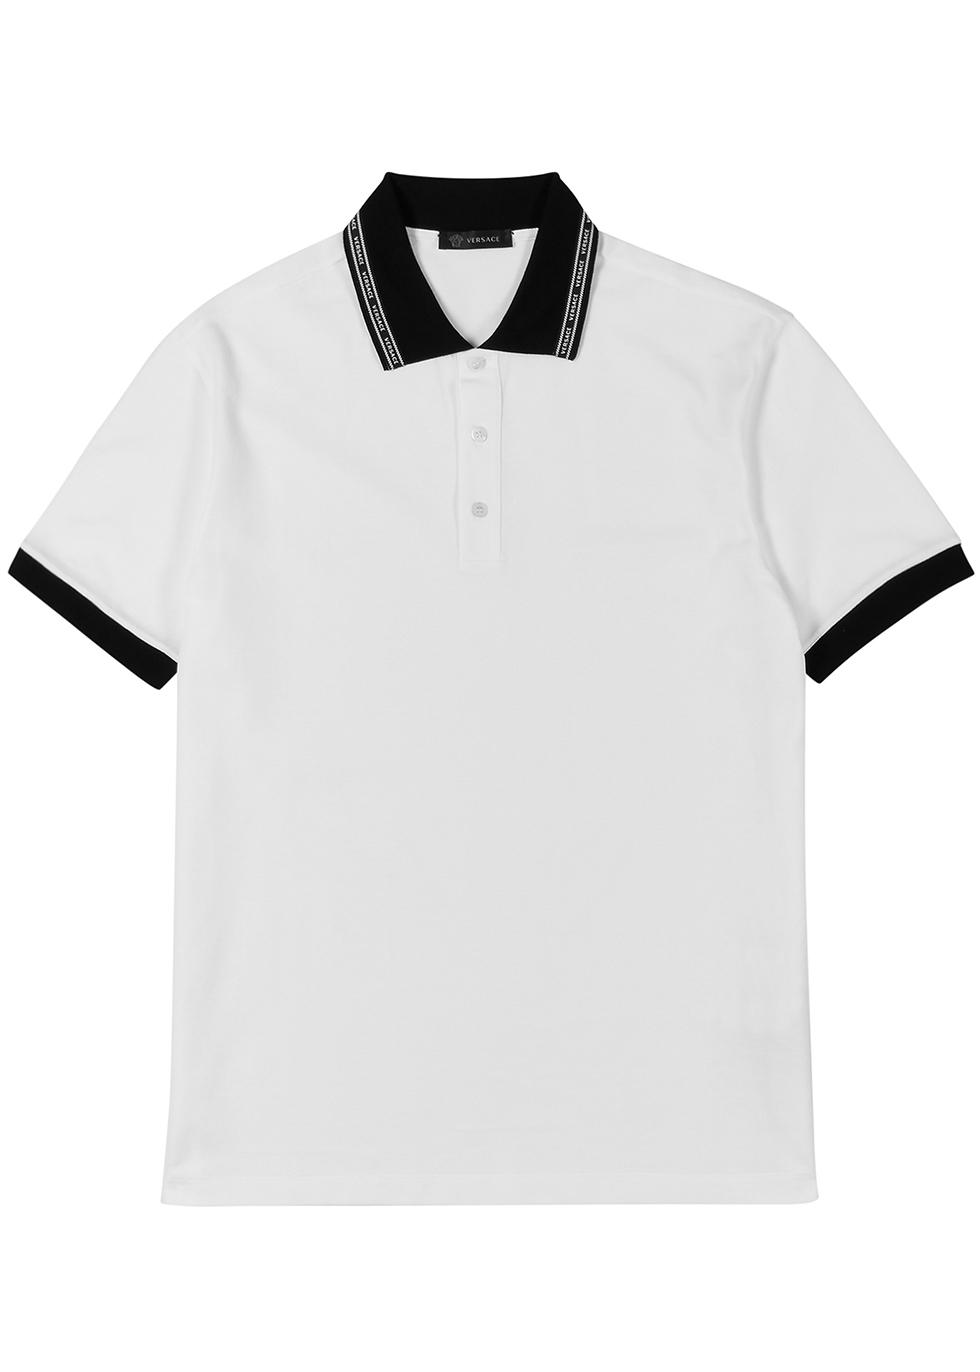 0cd853f95 Men s Designer Polo Shirts - Harvey Nichols